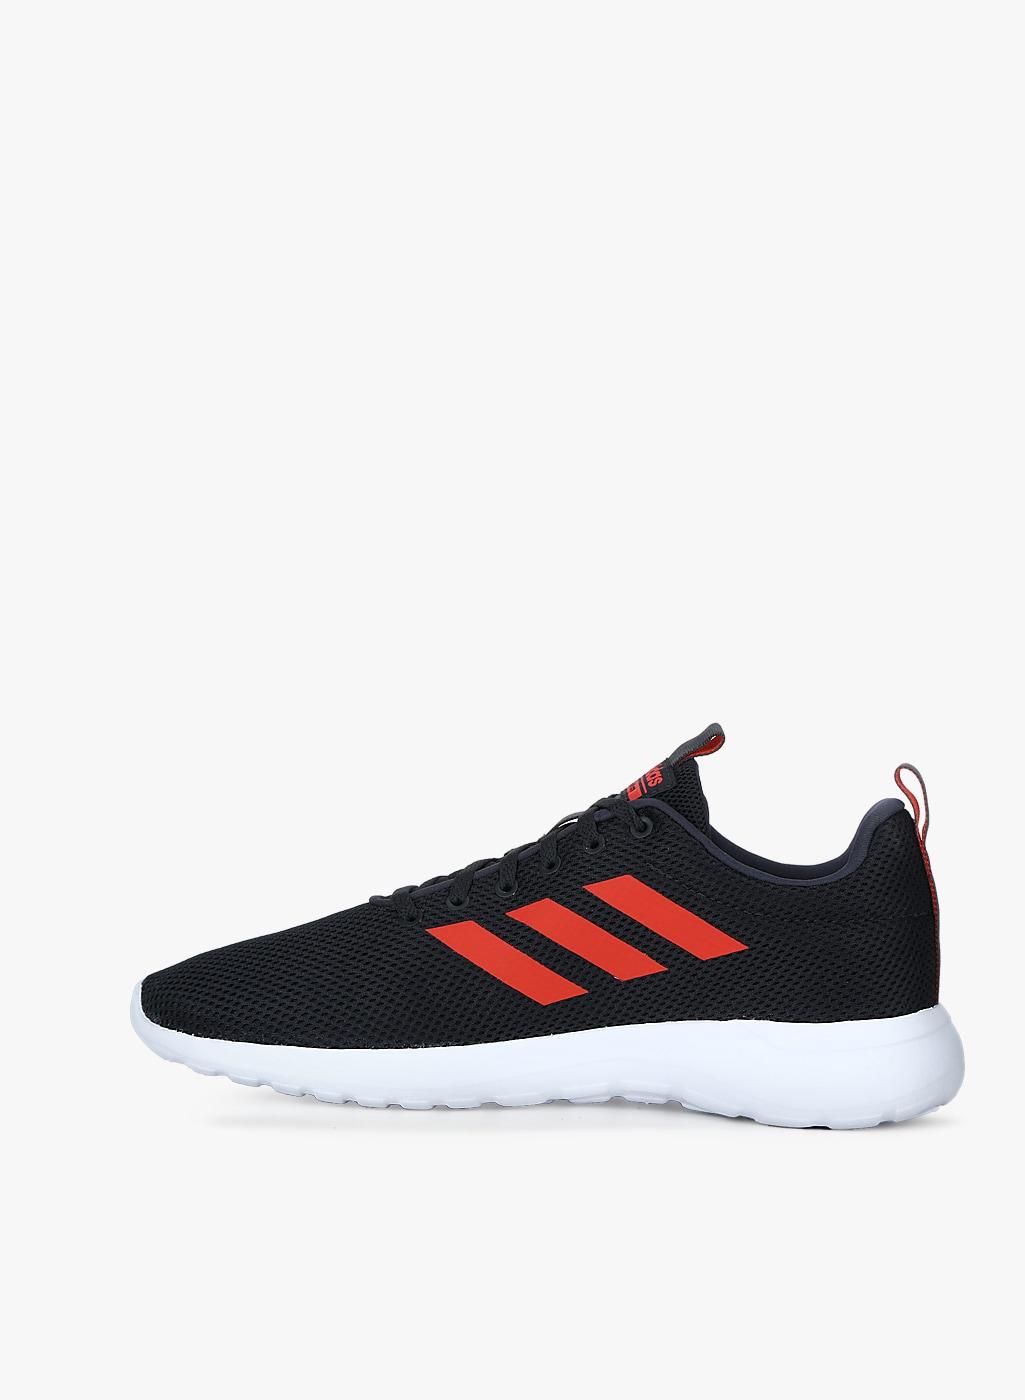 ADIDAS Lite Racer Cln Black Running Shoes